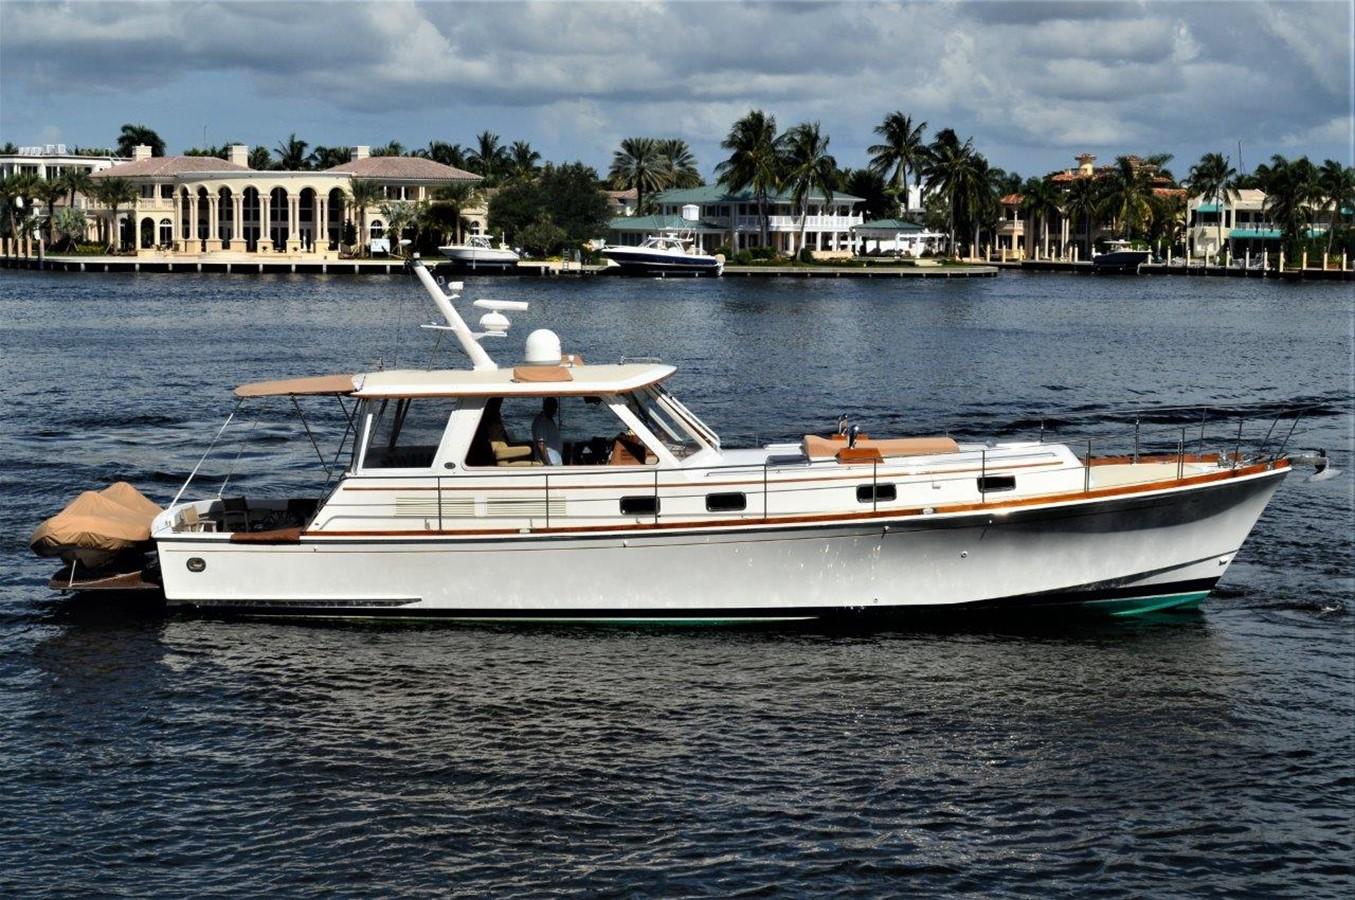 2000 GRAND BANKS 49 Eastbay HX Cruiser 2669776